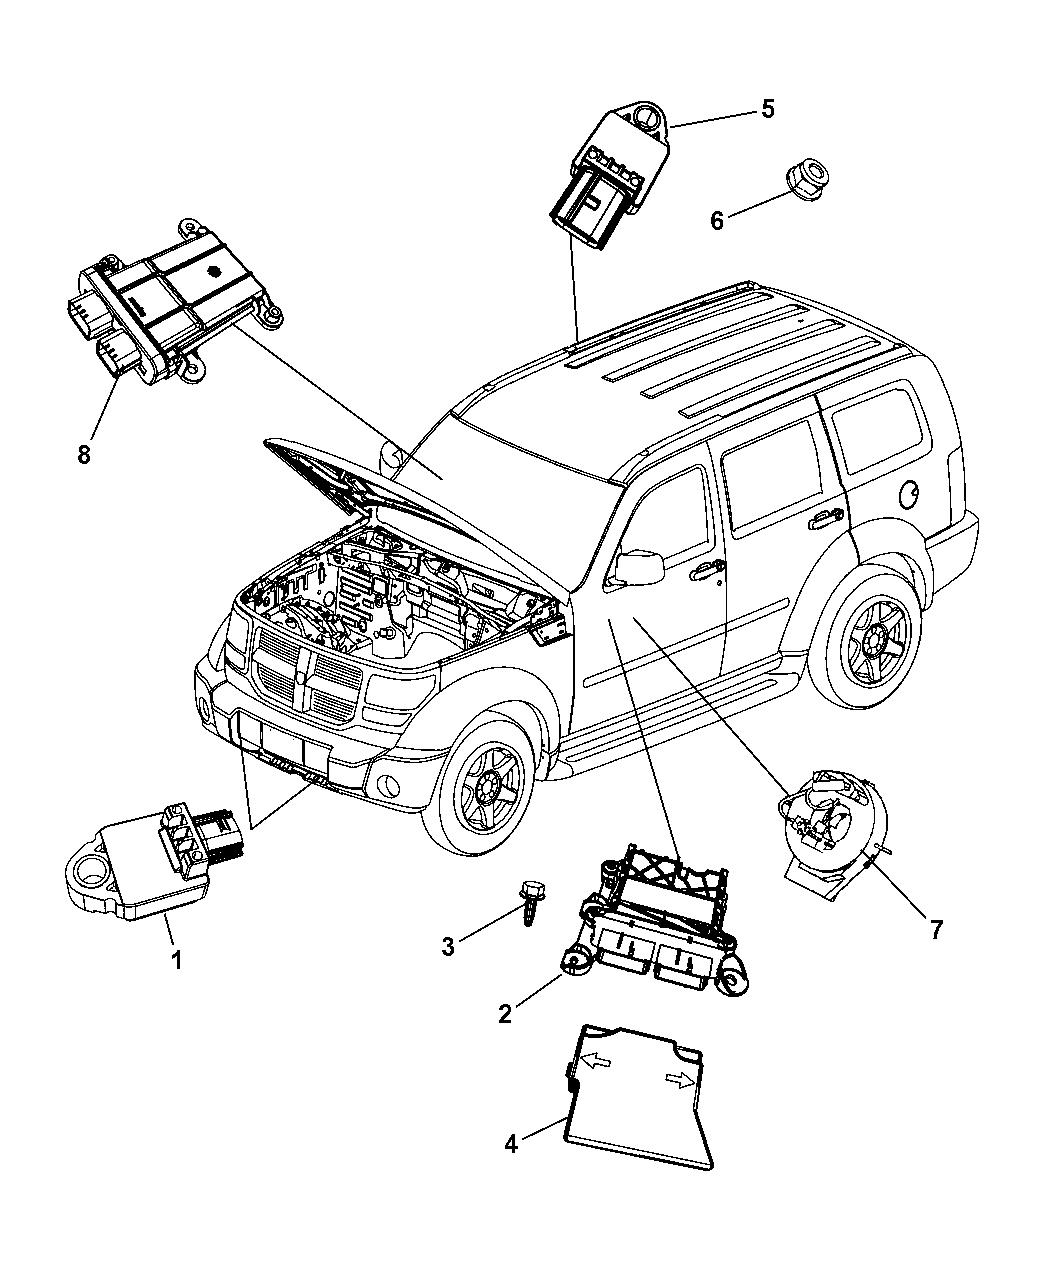 68003216ah